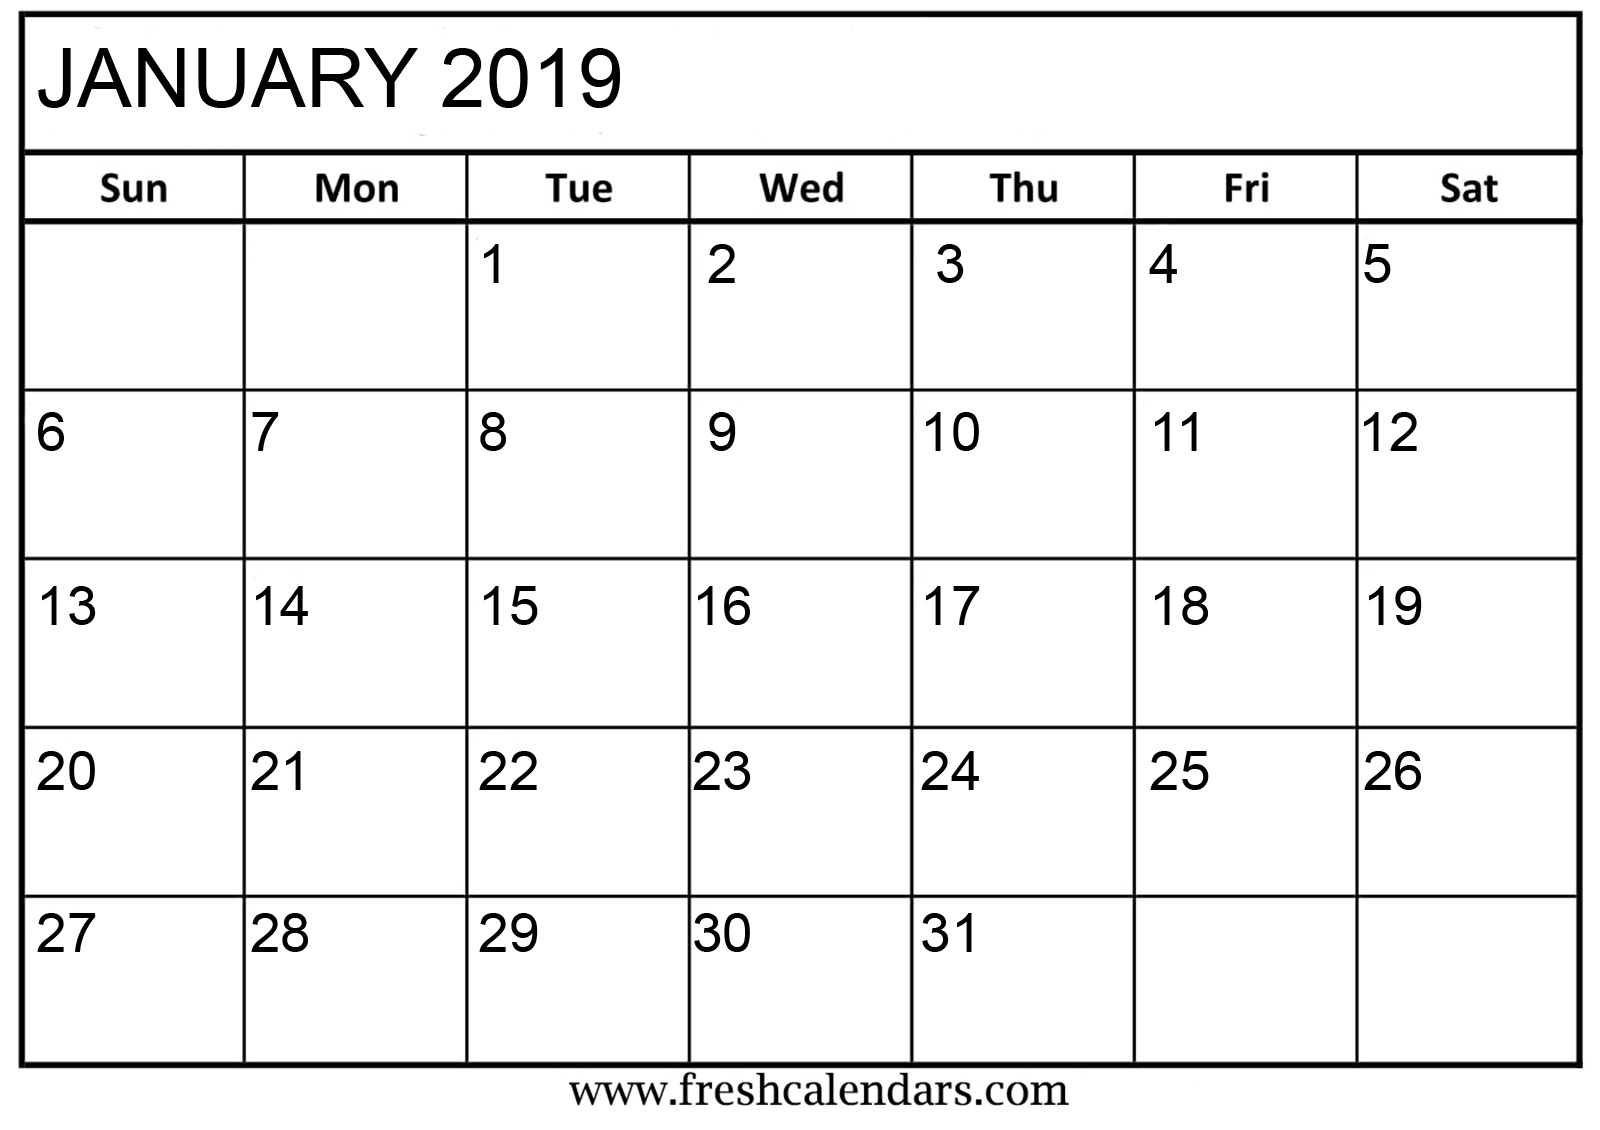 January 2019 Calendar Printable - Fresh Calendars in Large Blank Monthly Calendars January Printable